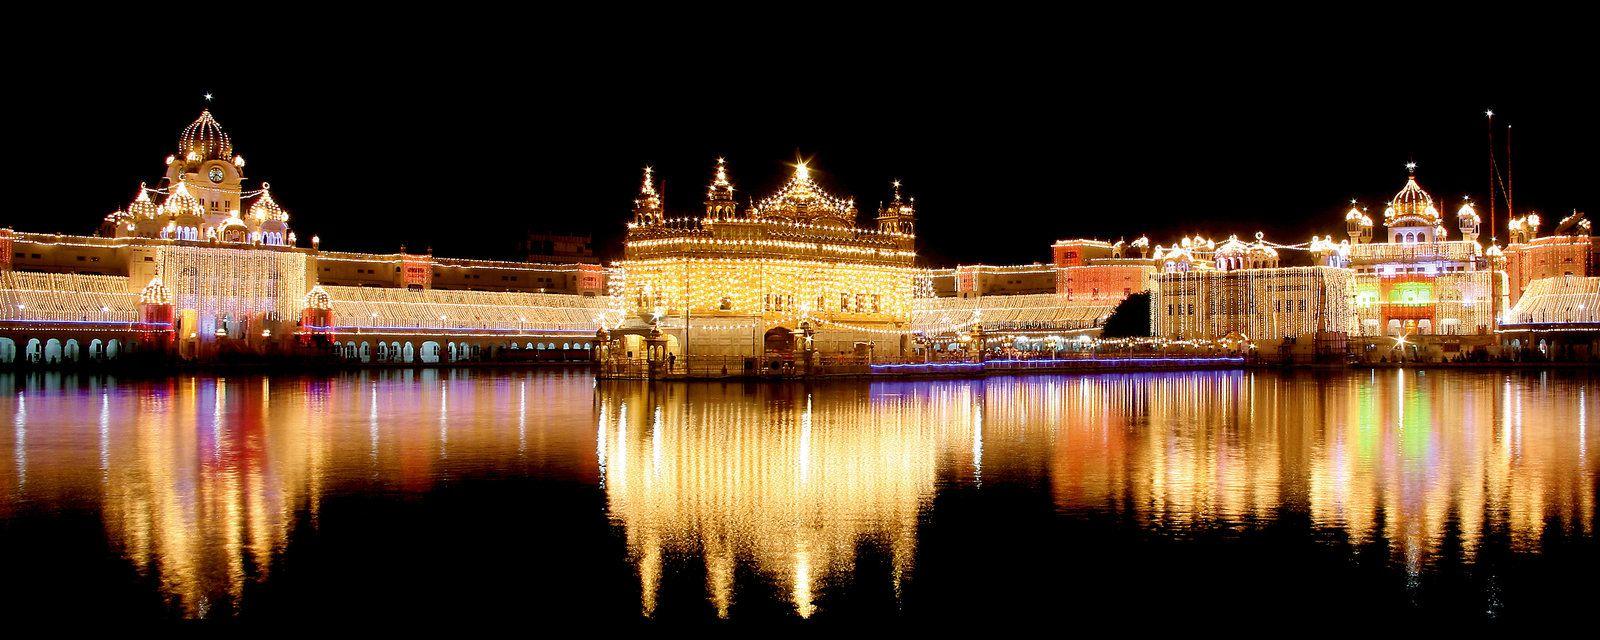 Golden Temple Sri Harmandir Sahib Amritsar Golden Temple Harmandir Sahib Amritsar